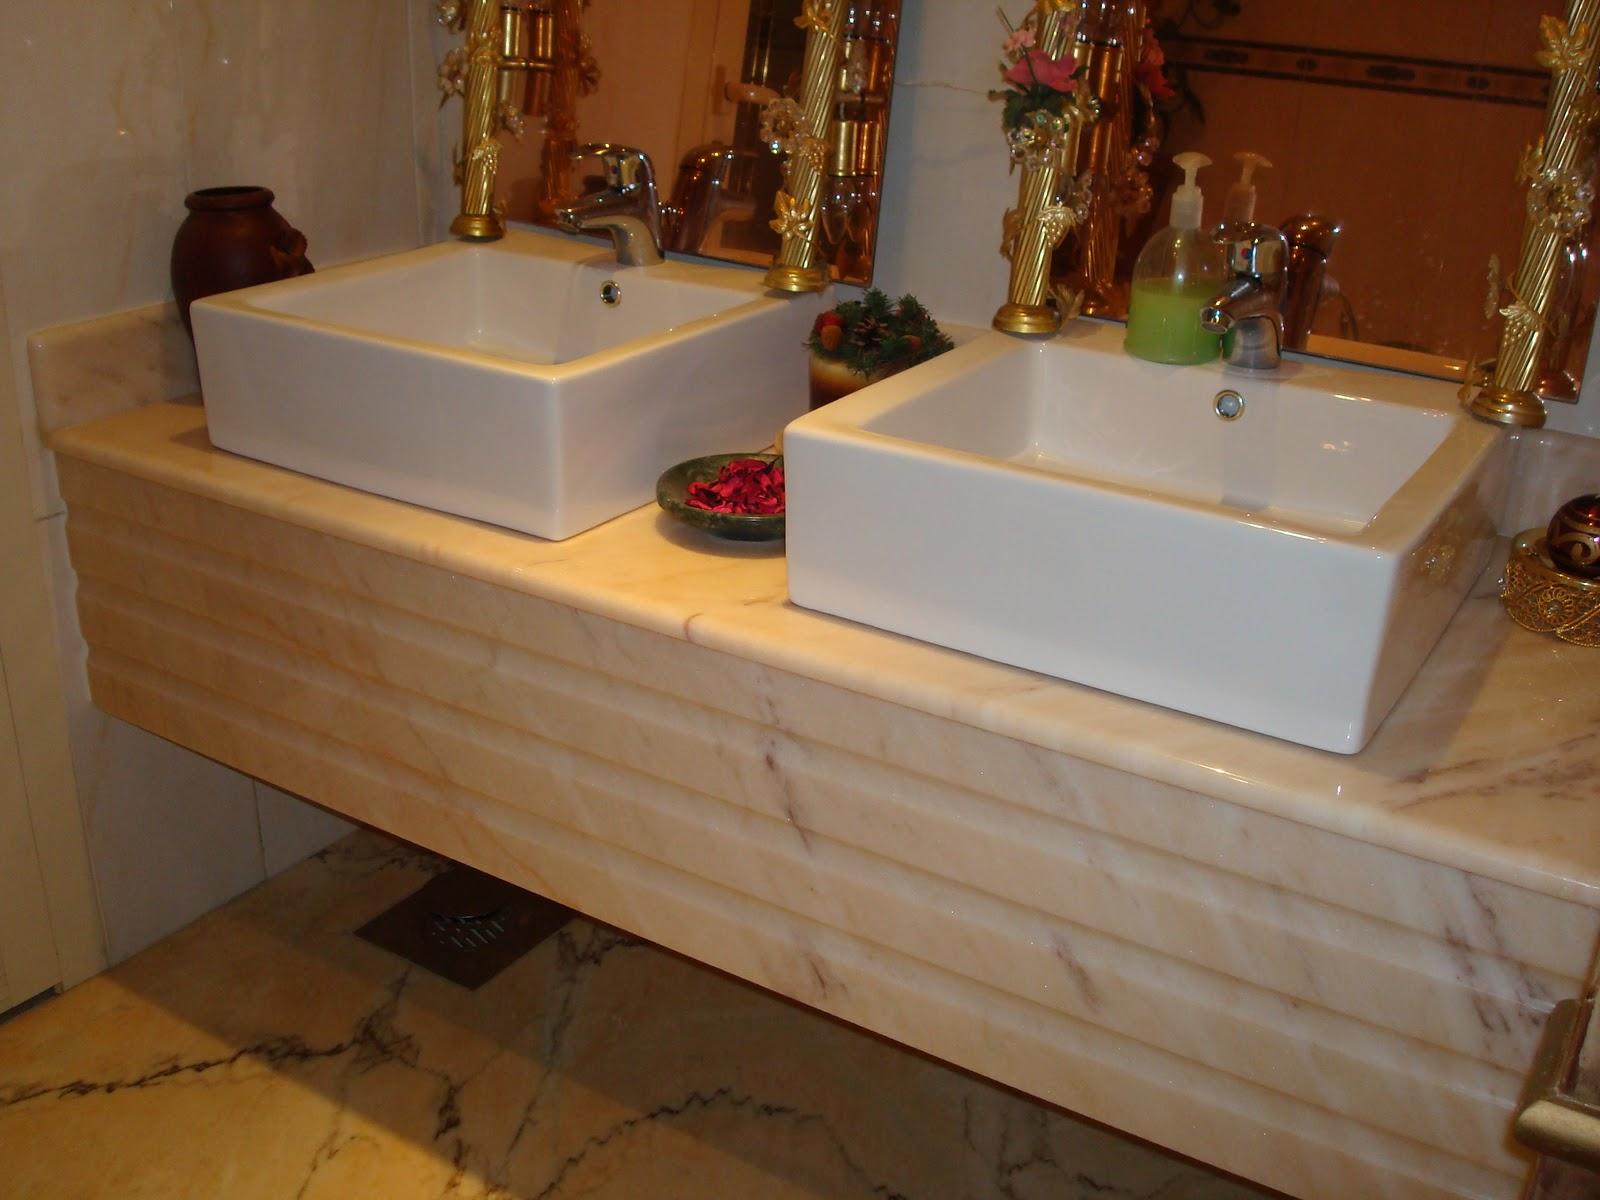 بالصور مغاسل حمامات , فخامة مغاسل دورات المياه تجدها هنا 1390 12